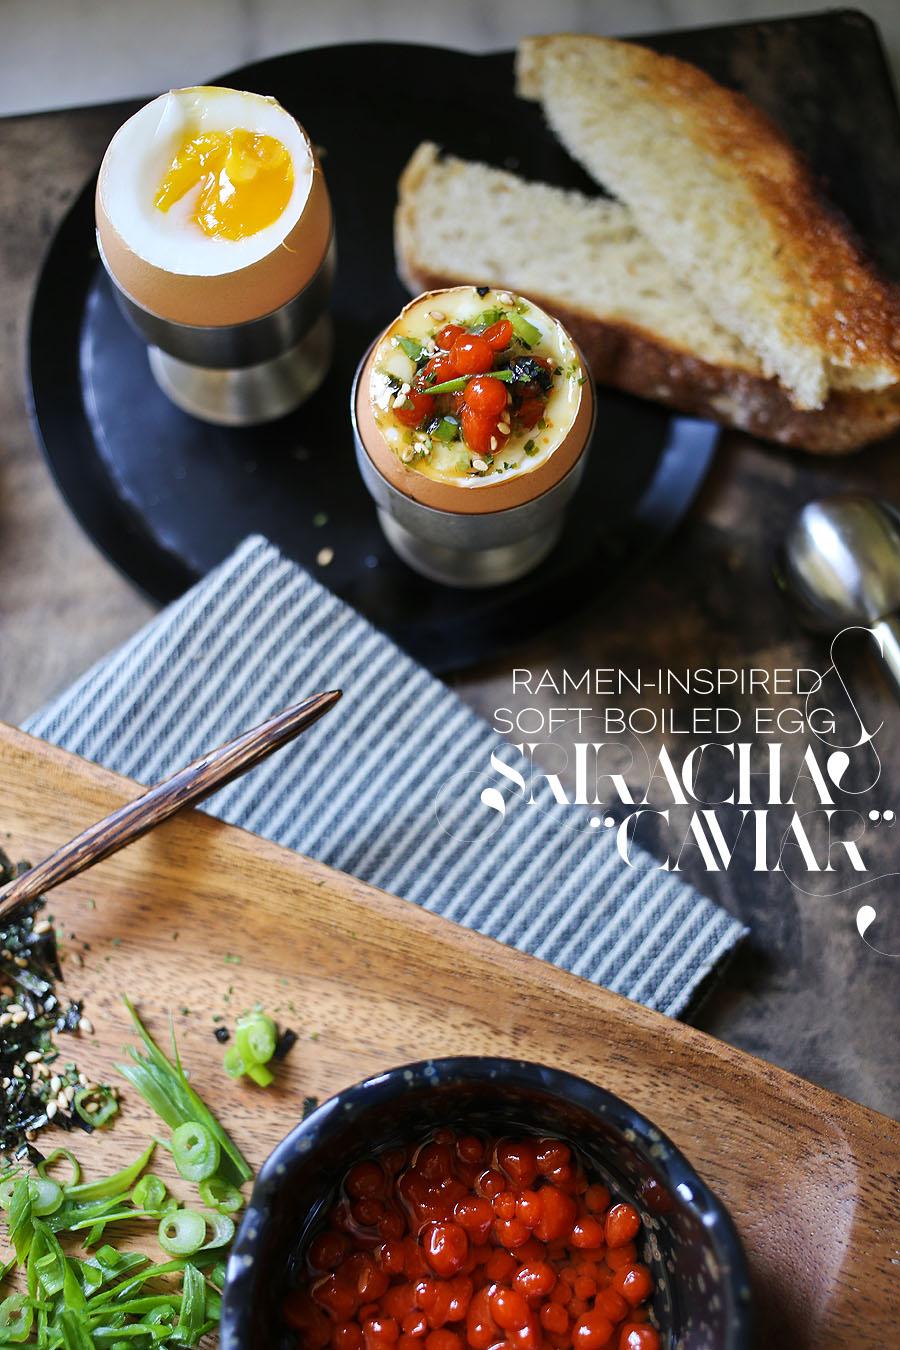 Ramen Inspired Egg With Sriracha Caviar Recipe   dinexdesign.com